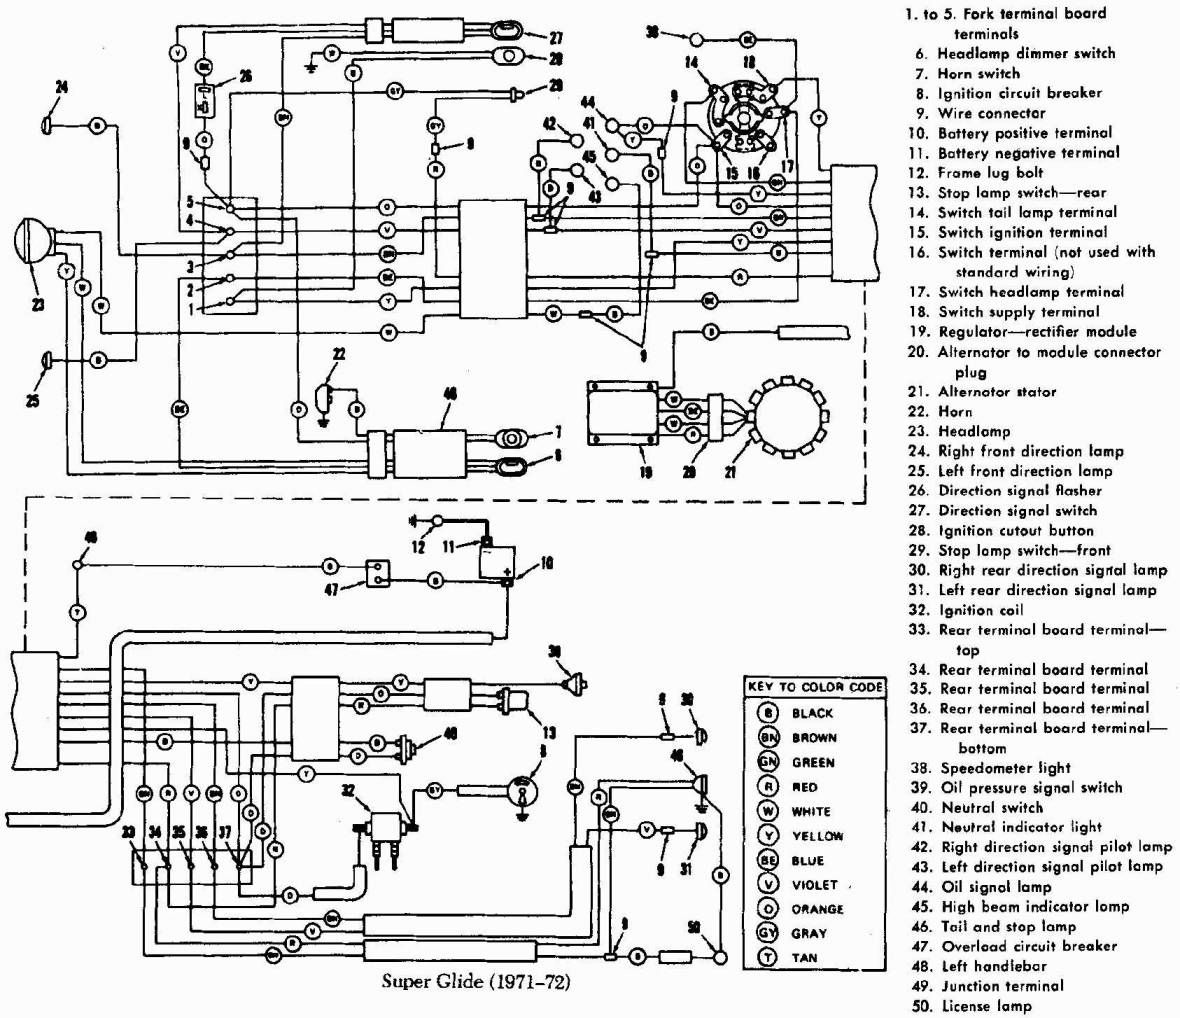 15+ Harley Headlight Wiring Diagram | Softail, Motorcycle wiring, Diagram | 2005 Harley Davidson Wiring Diagram |  | Pinterest